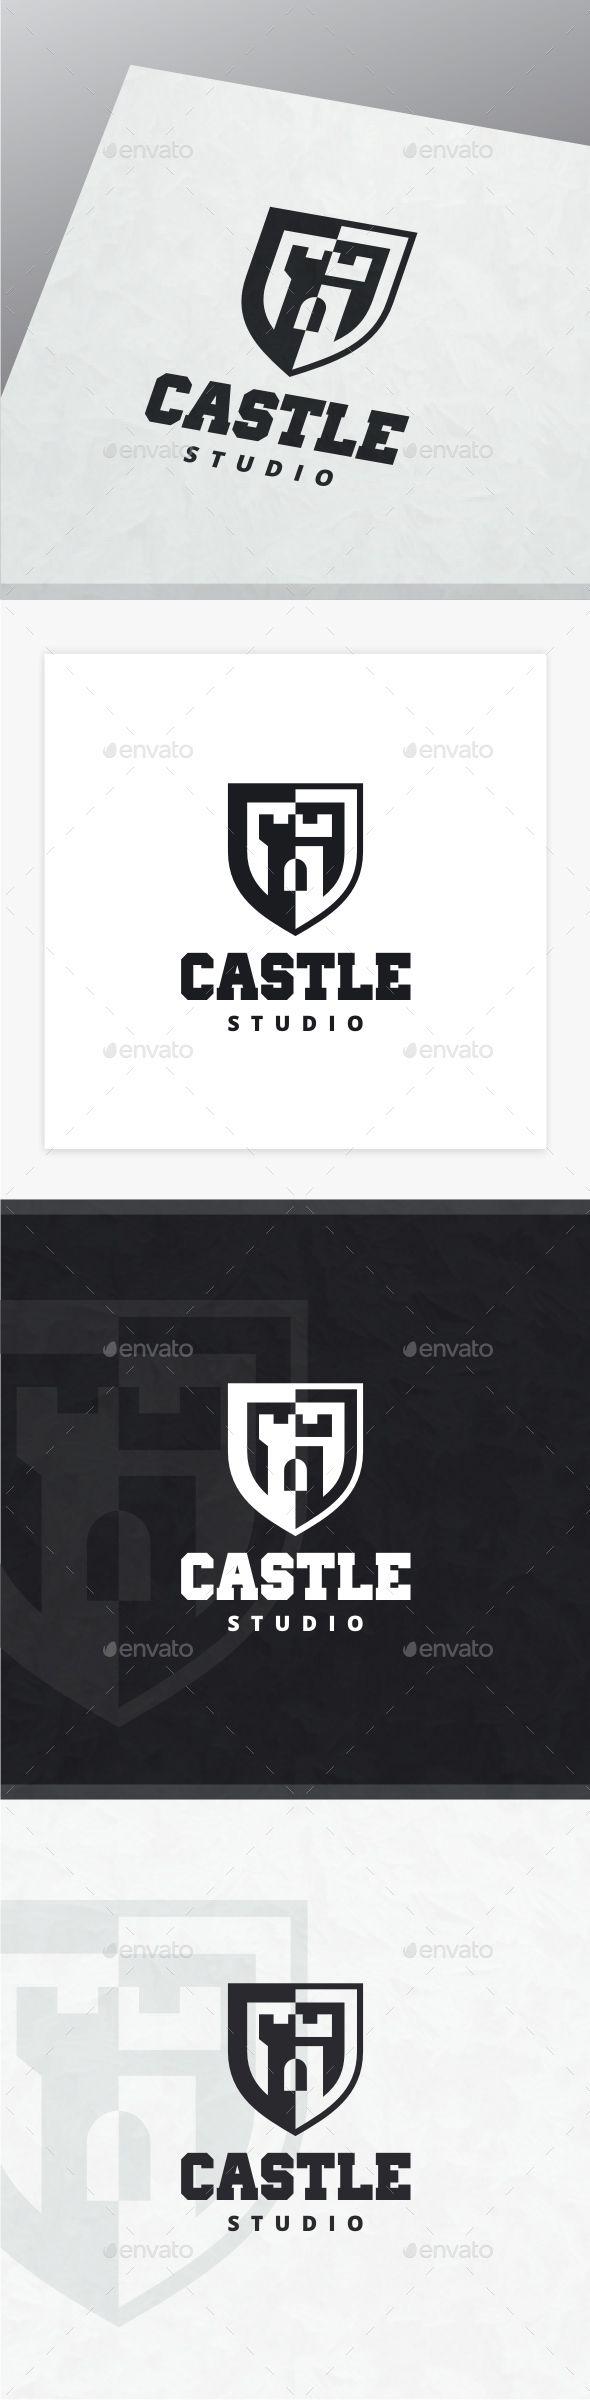 Castle Logo  — PSD Template #fort #design • Download ➝ https://graphicriver.net/item/castle-logo/18395040?ref=pxcr